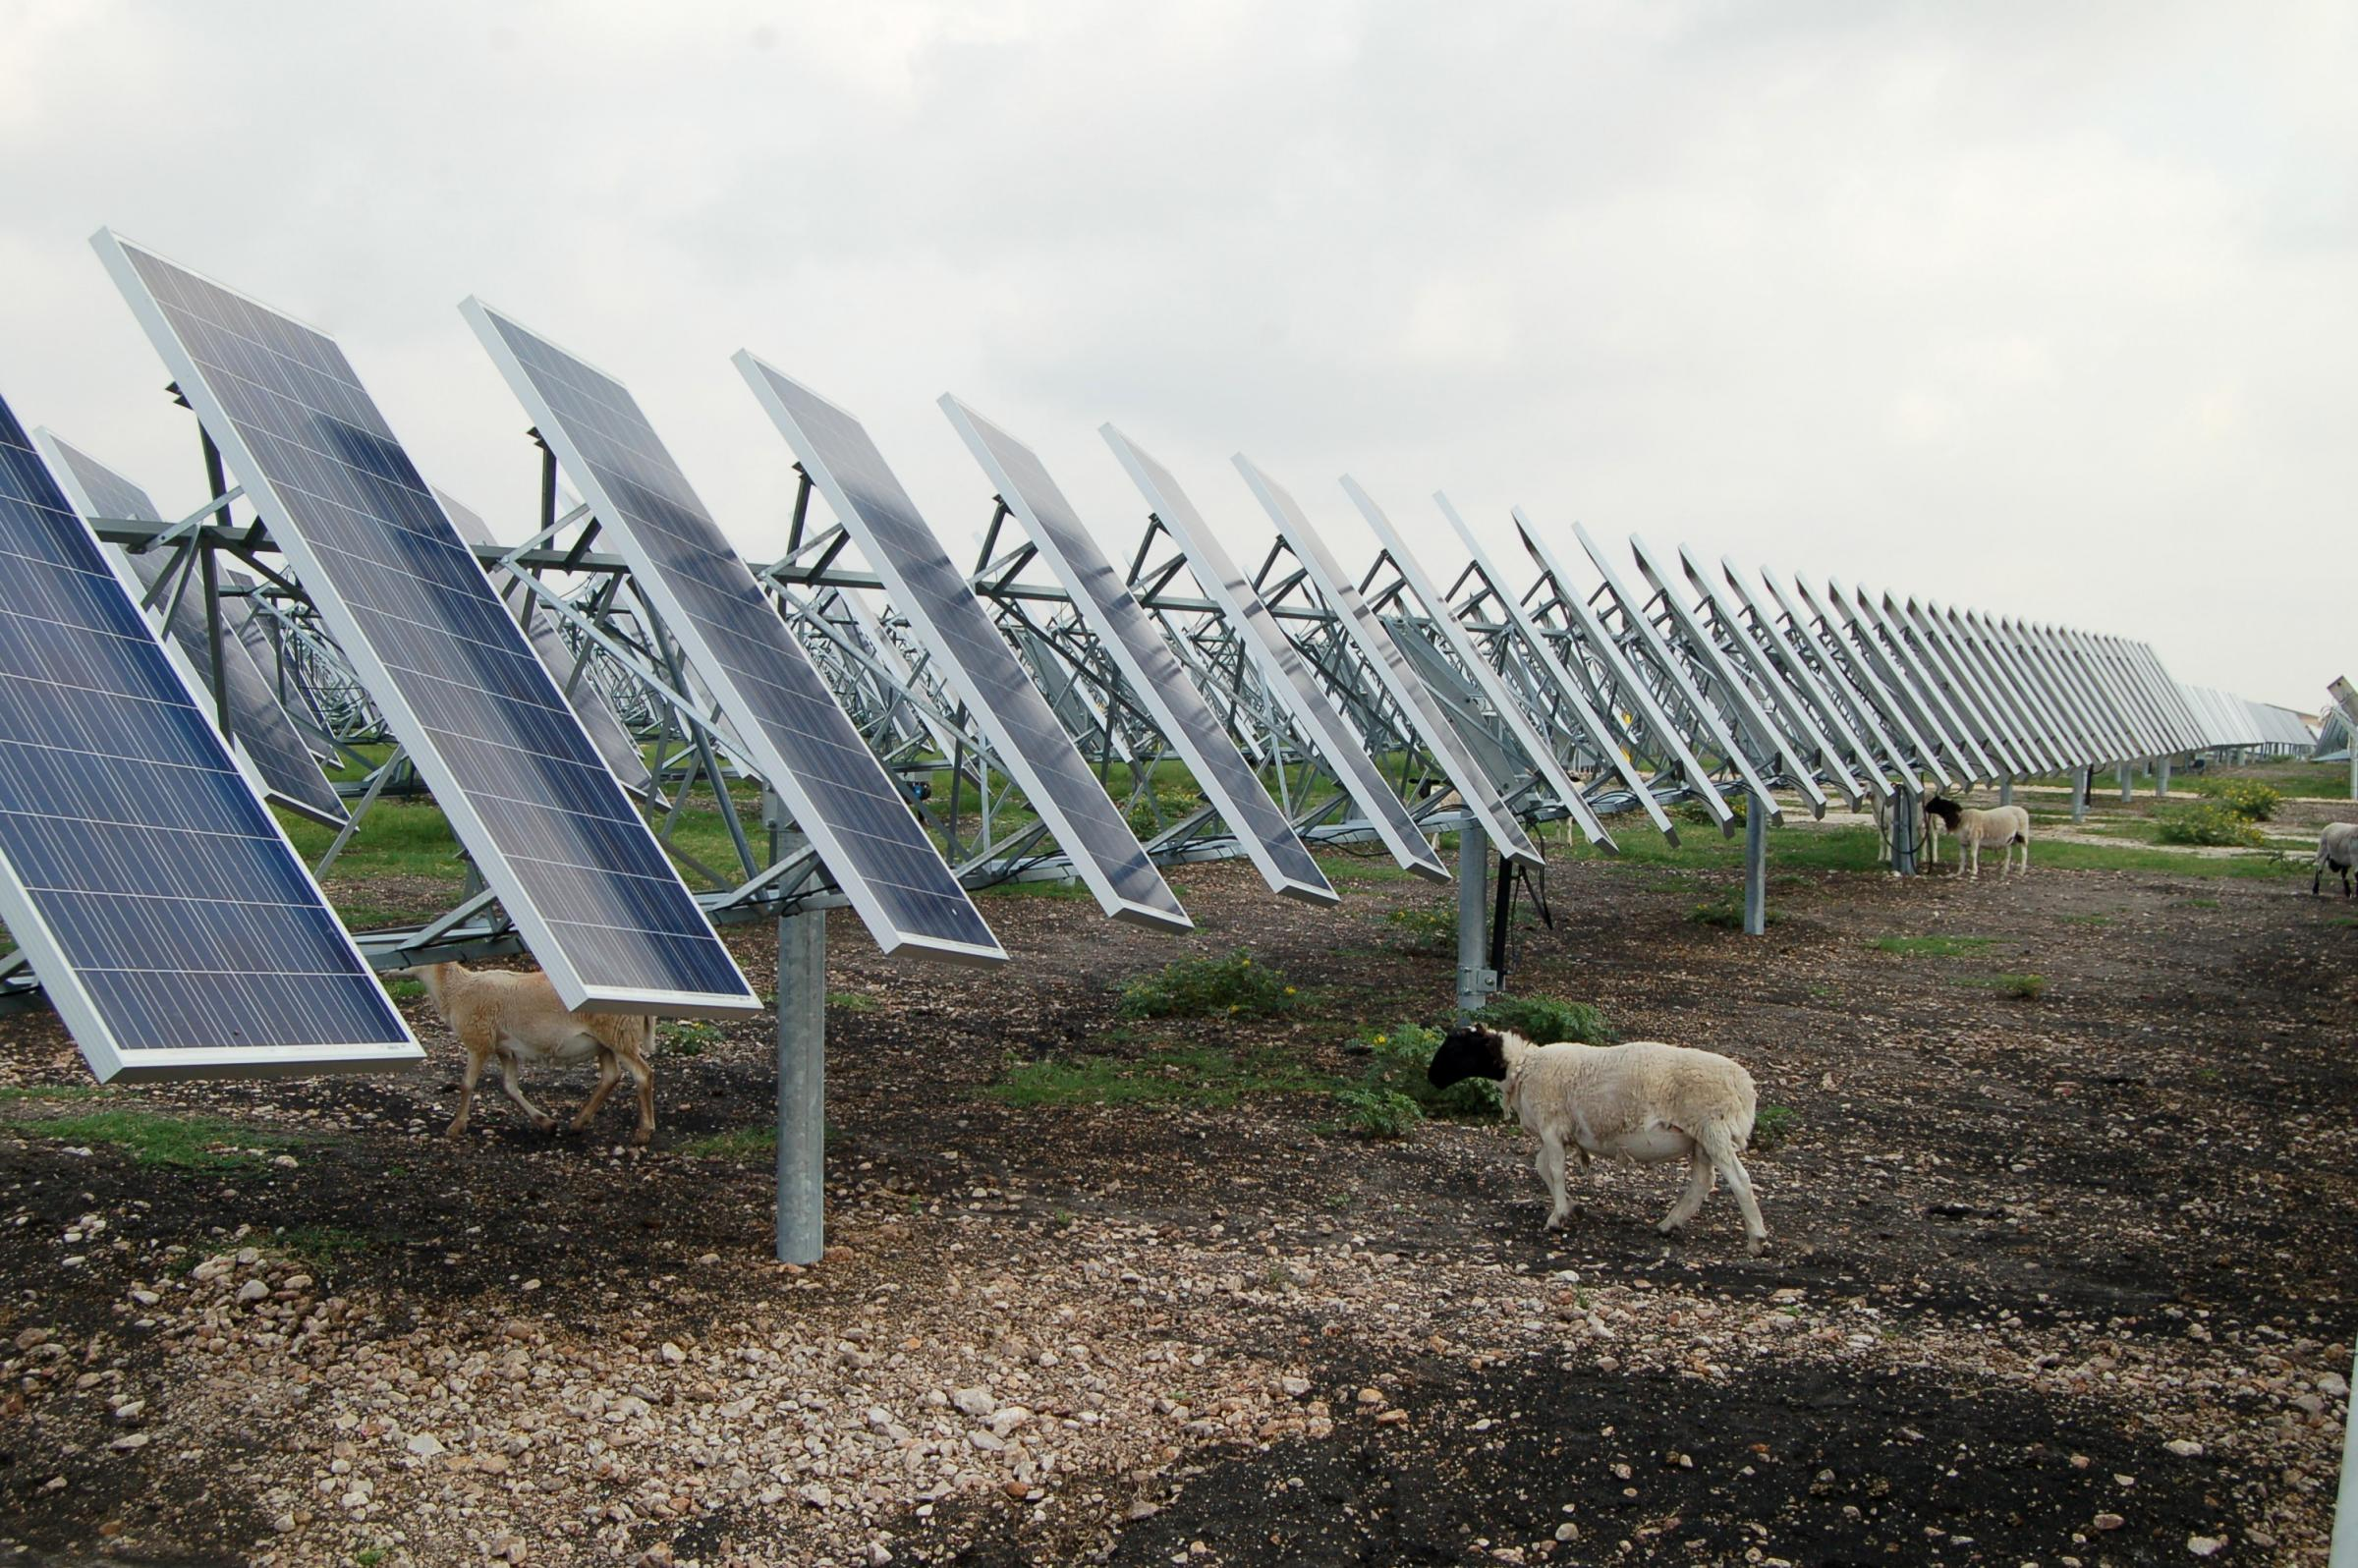 Sheep keeping grass under control at oci solar farm in for Solar ranch